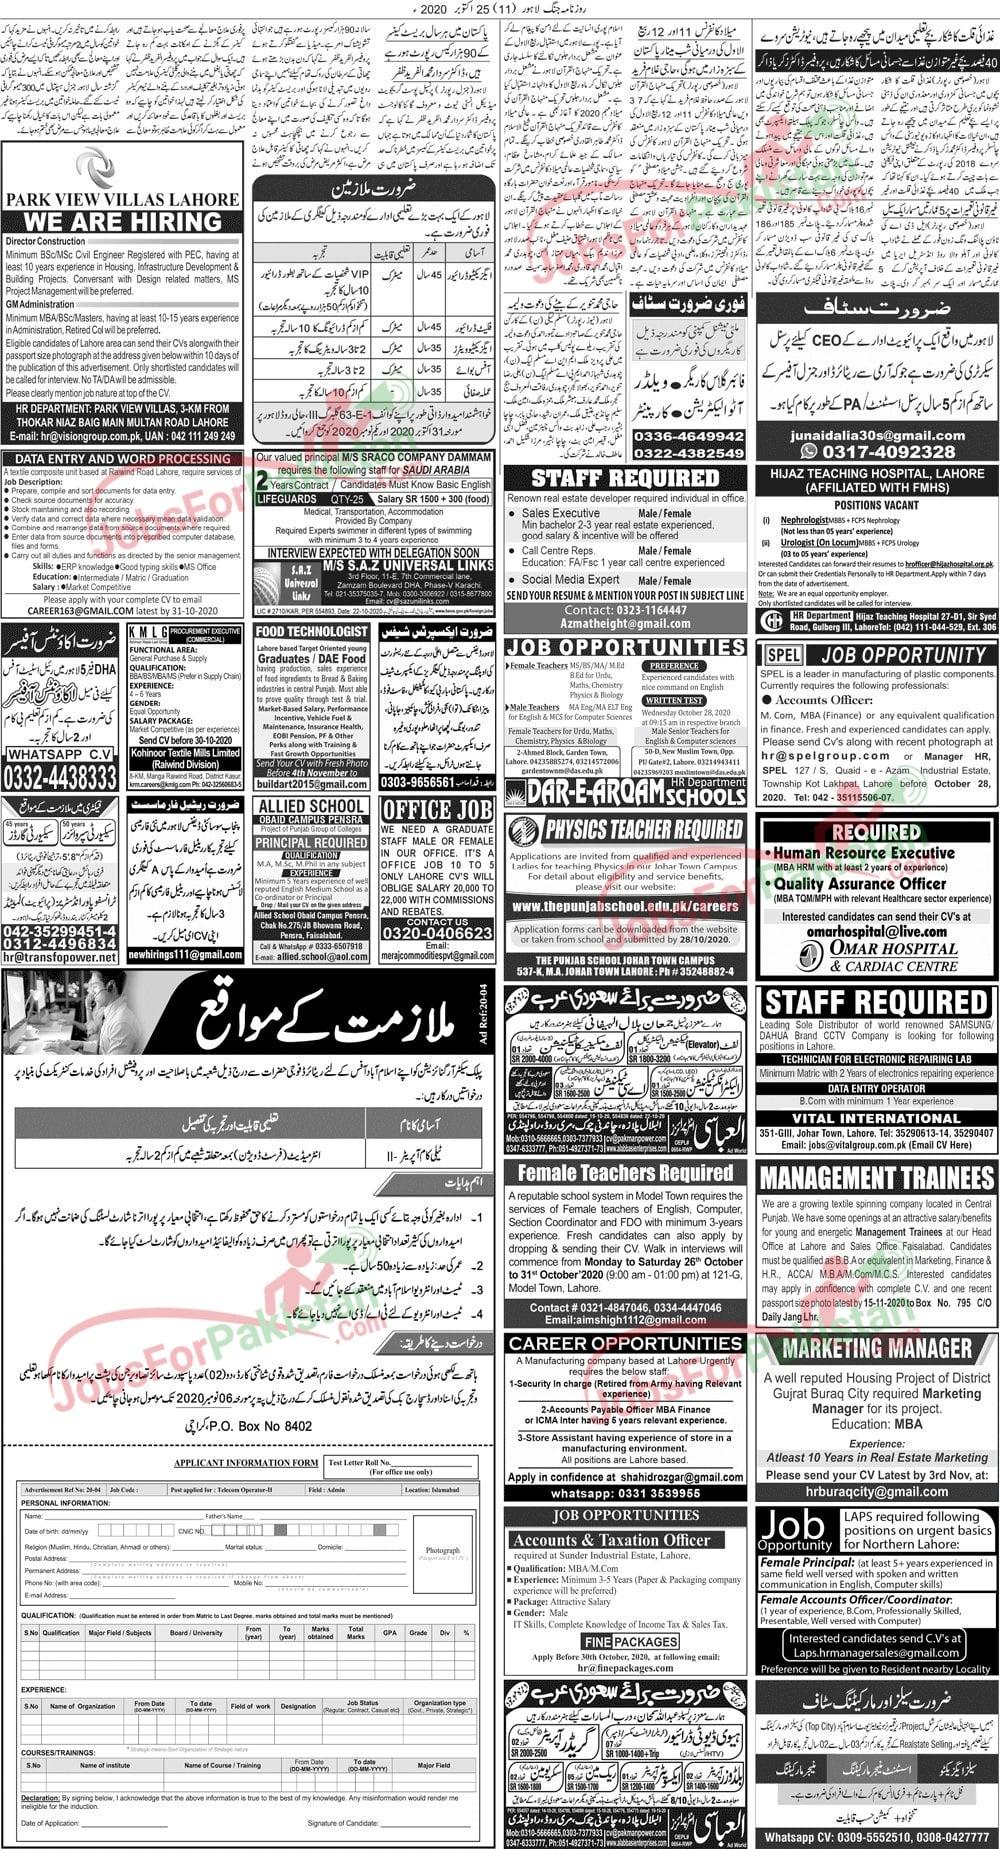 Jang Newspaper Lahore Sunday Classified 2020